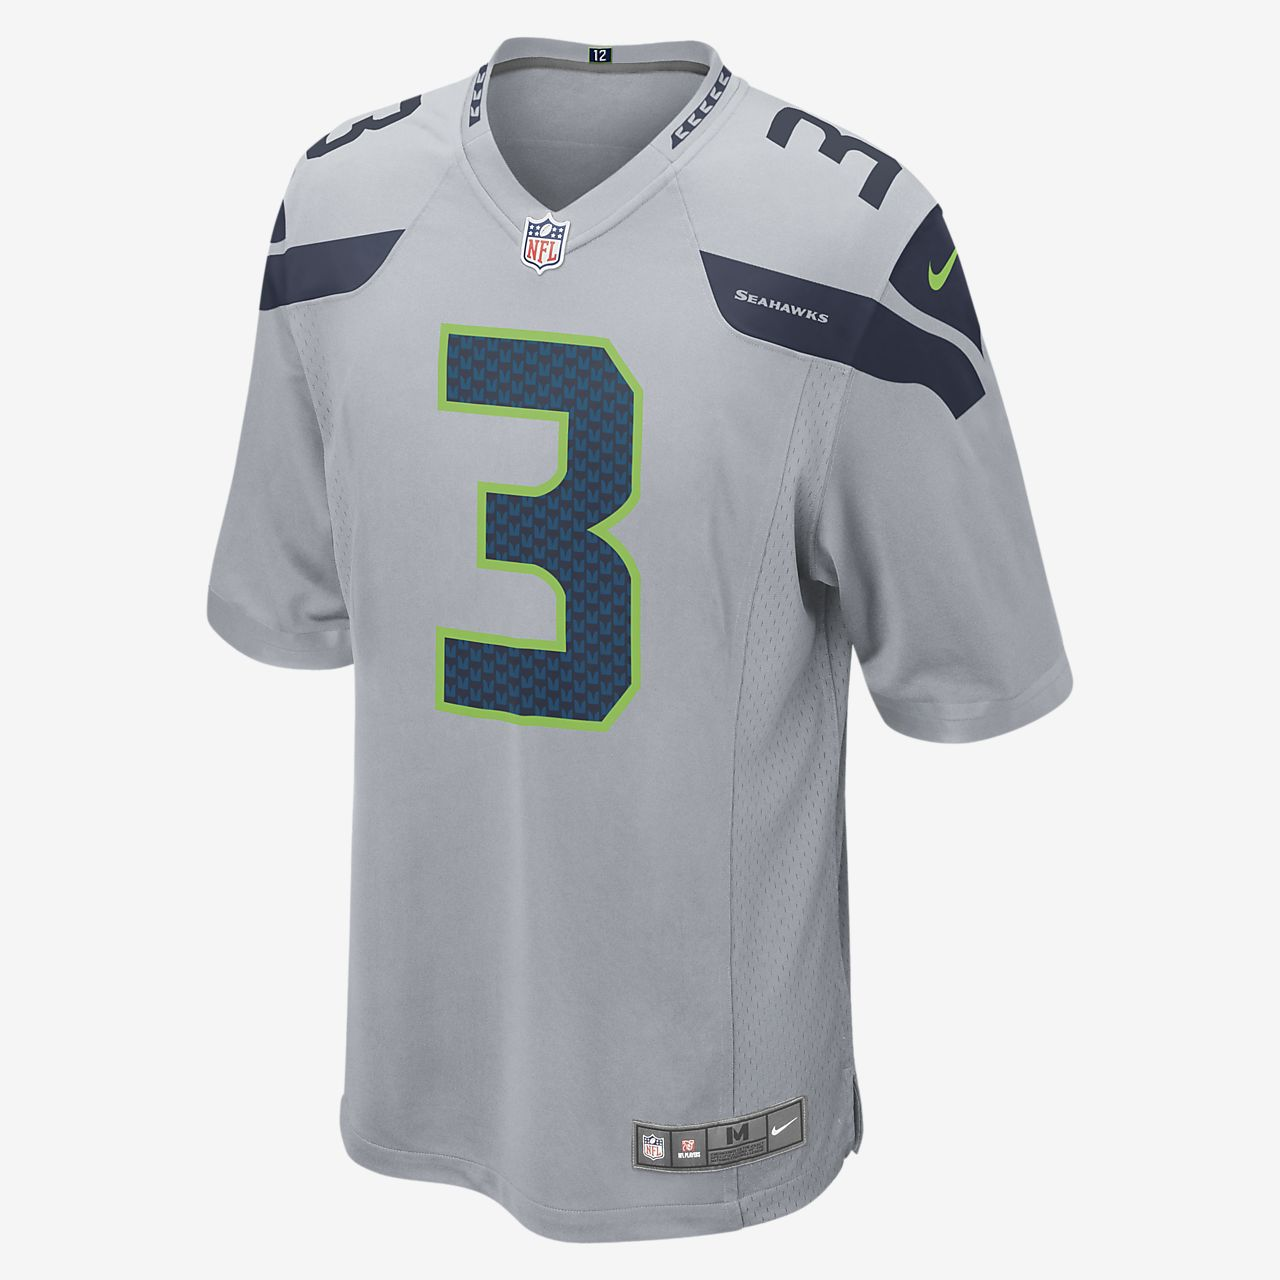 Pánský zápasový dres na americký fotbal NFL Seattle Seahawks (Russell Wilson)